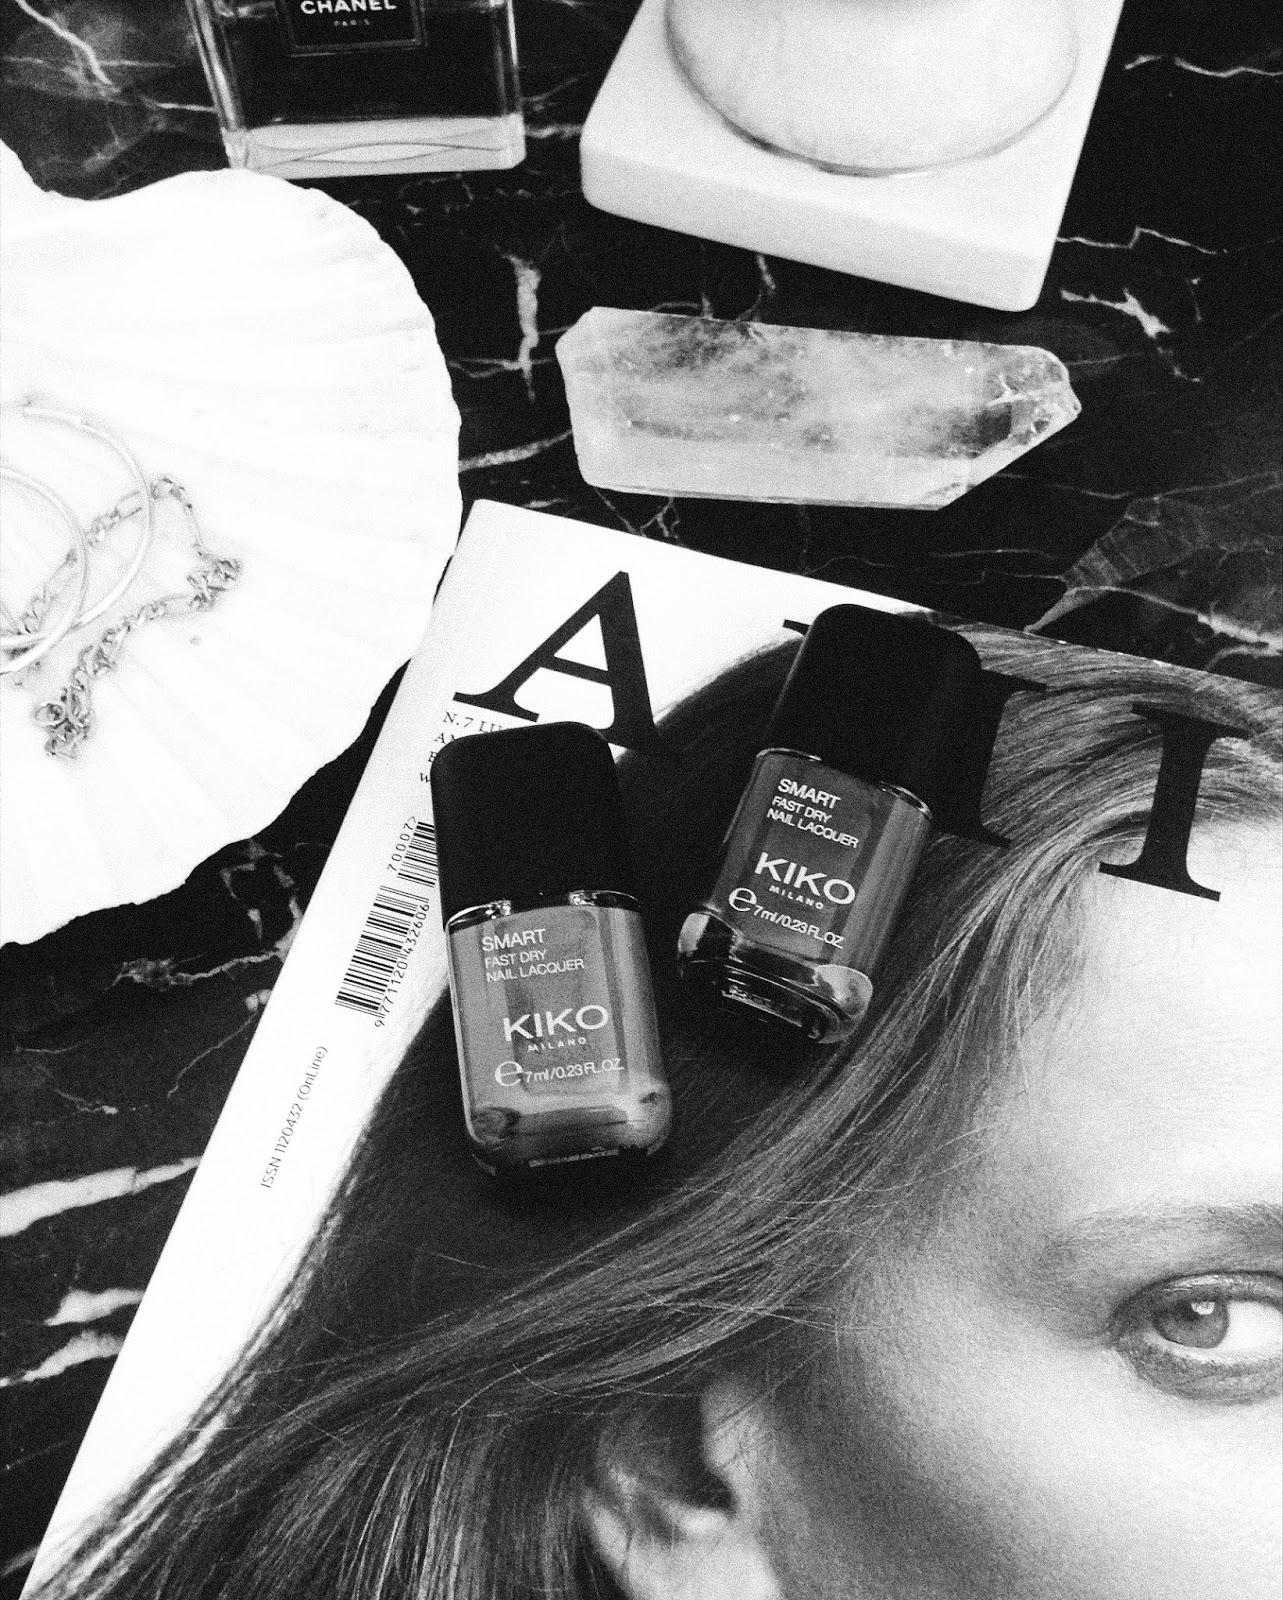 Kiko Nail Polish | Summer 2017 | Allegory of Vanity